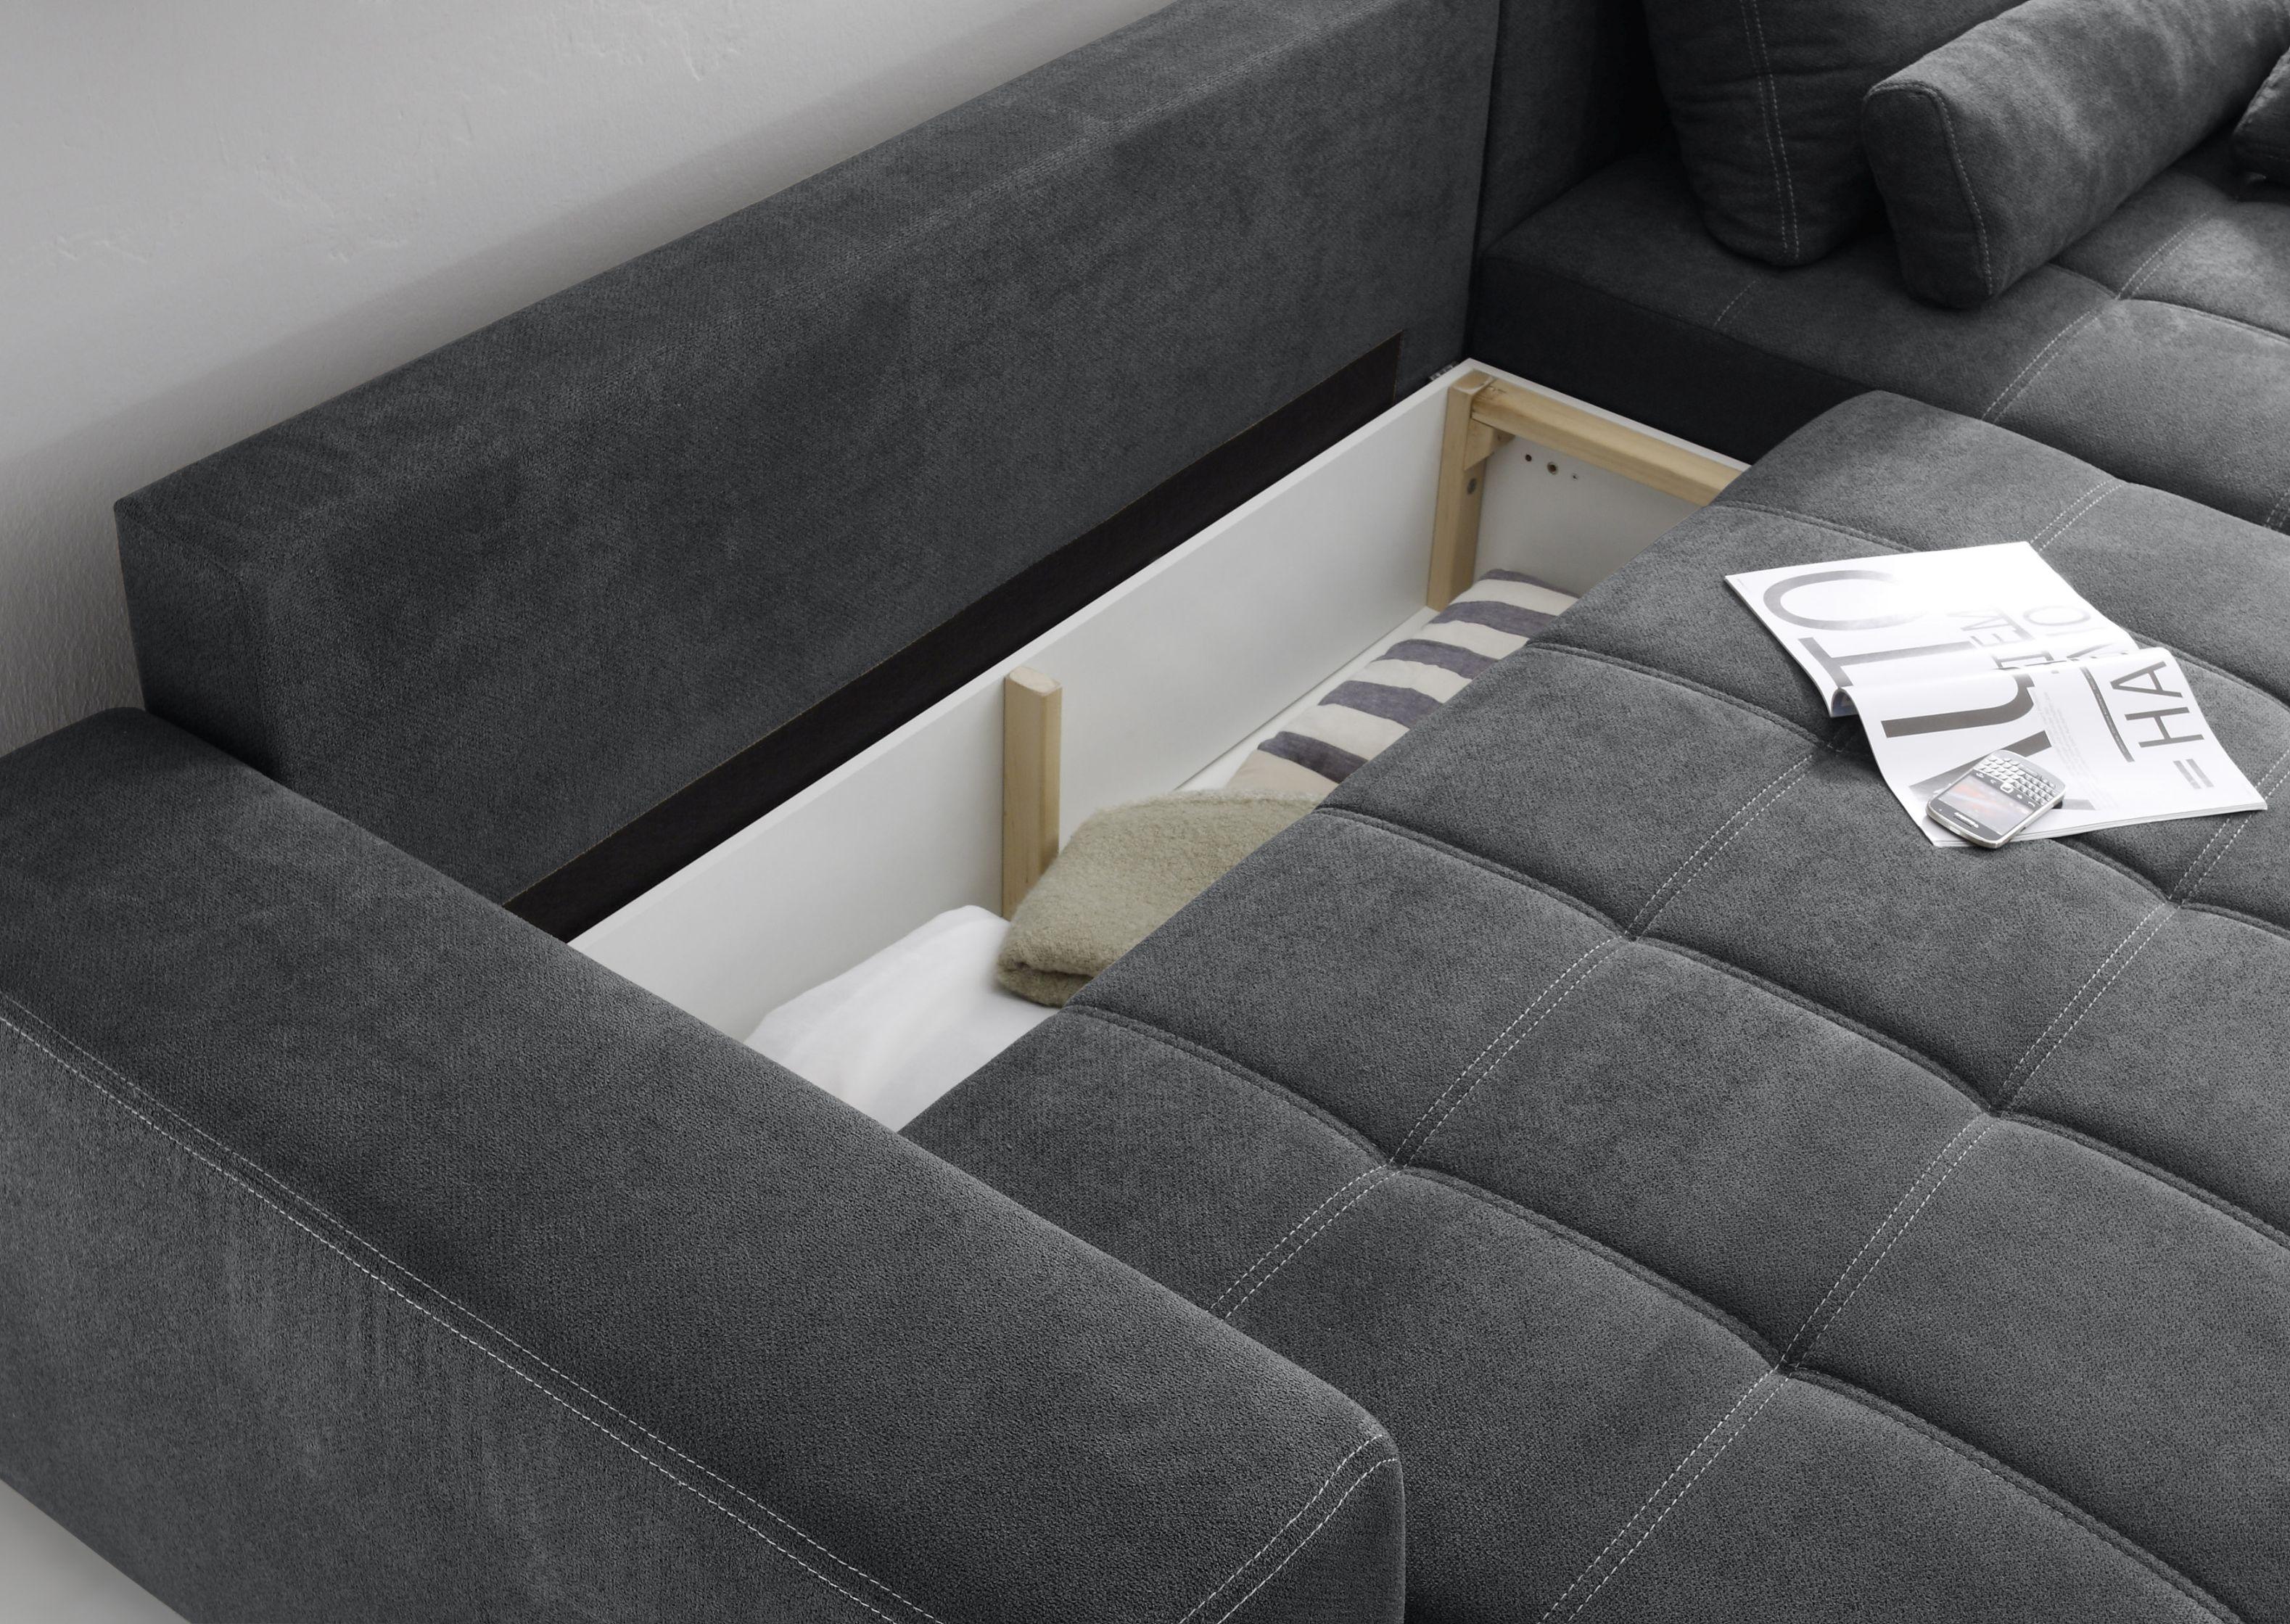 eckcouch lopez couch schlafsofa funktionssofa ausziehbar grau 305 cm ebay. Black Bedroom Furniture Sets. Home Design Ideas